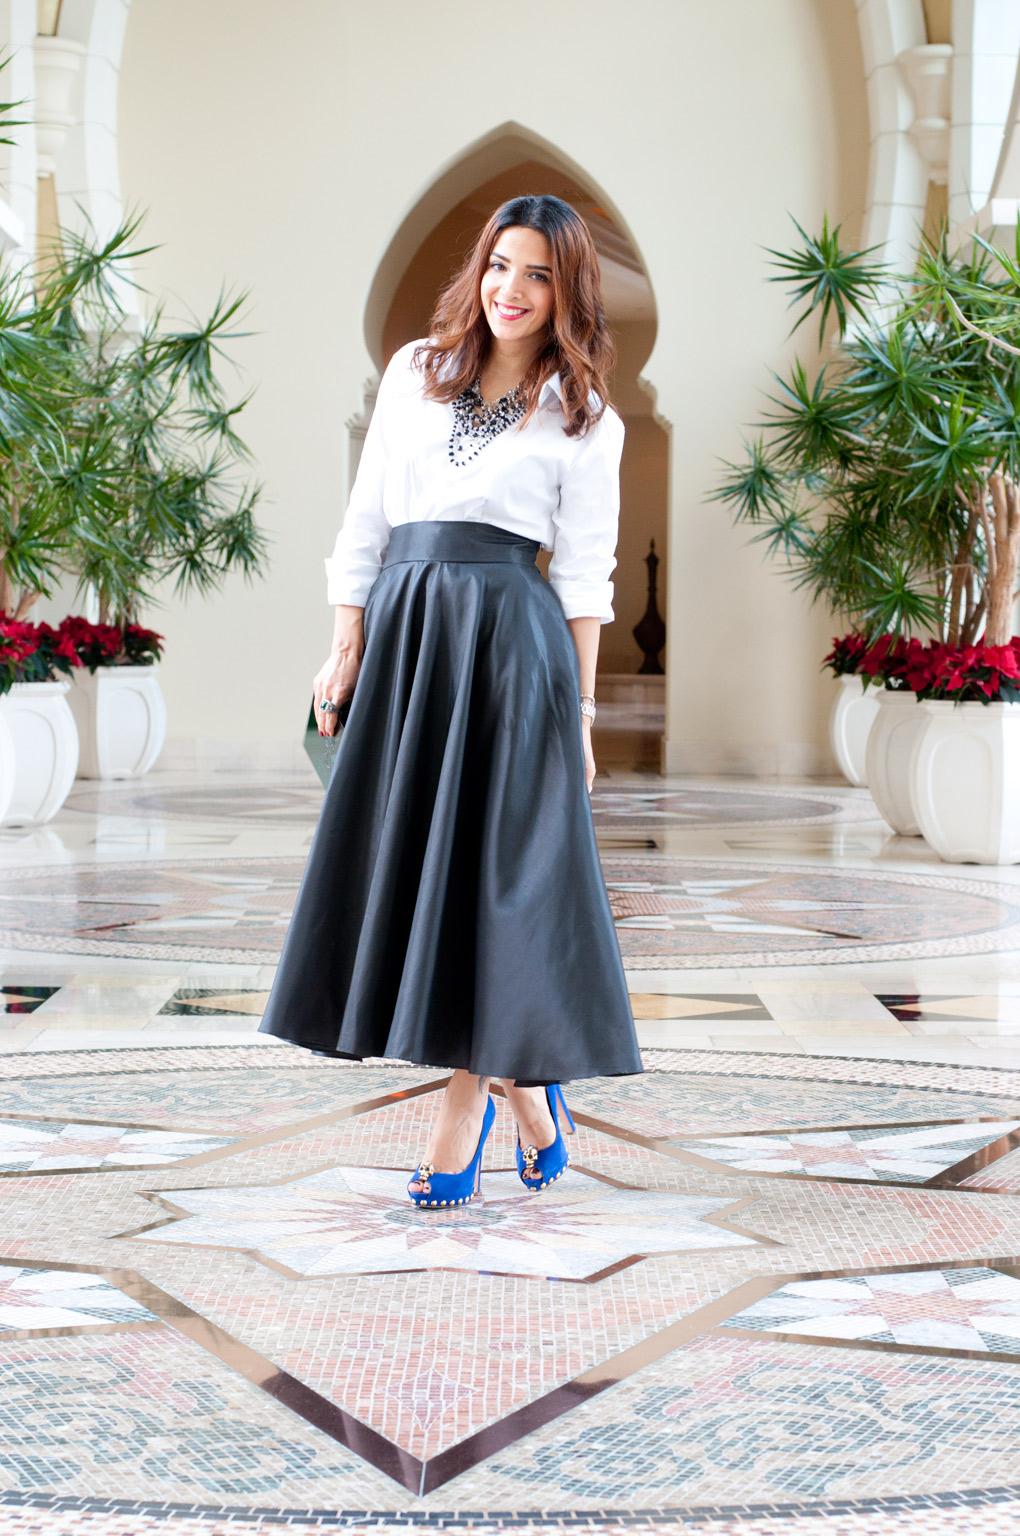 Lyla_Loves_Fashion_frost_midi_skirt_lafshar_mcqueen_SC_4999